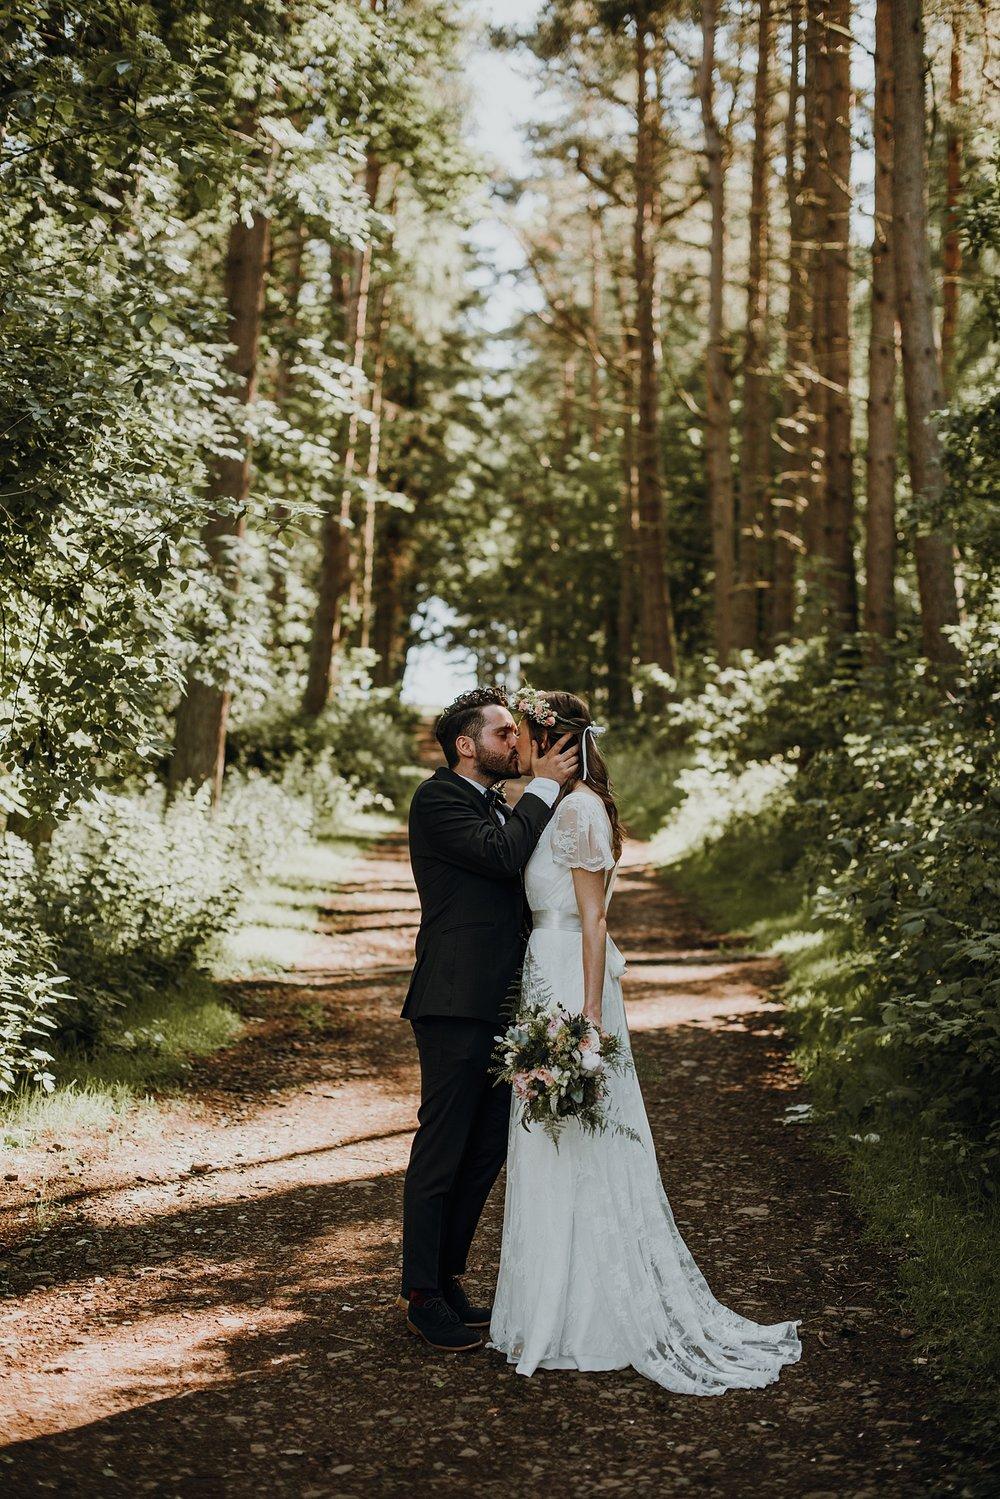 Claire-Fleck-Scottish-wedding-photography-2017__0020.jpg